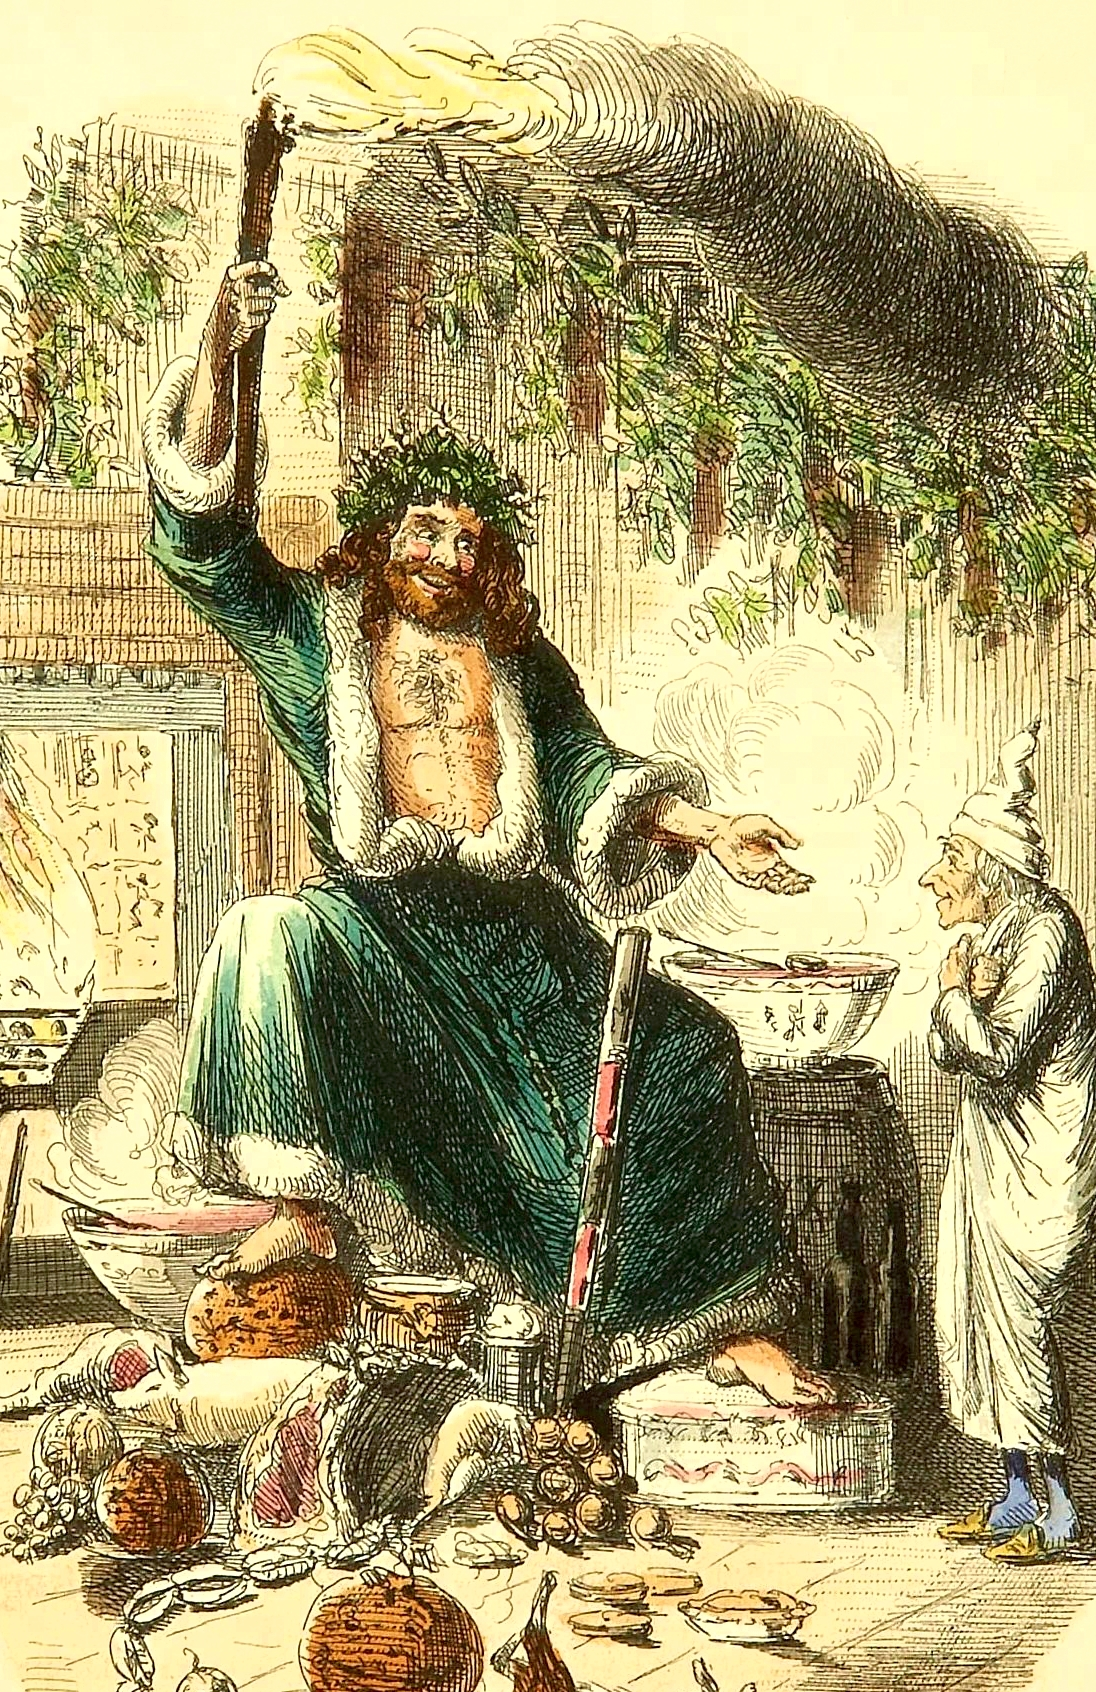 ghost_of_christmas_present_john_leech_1843.jpg